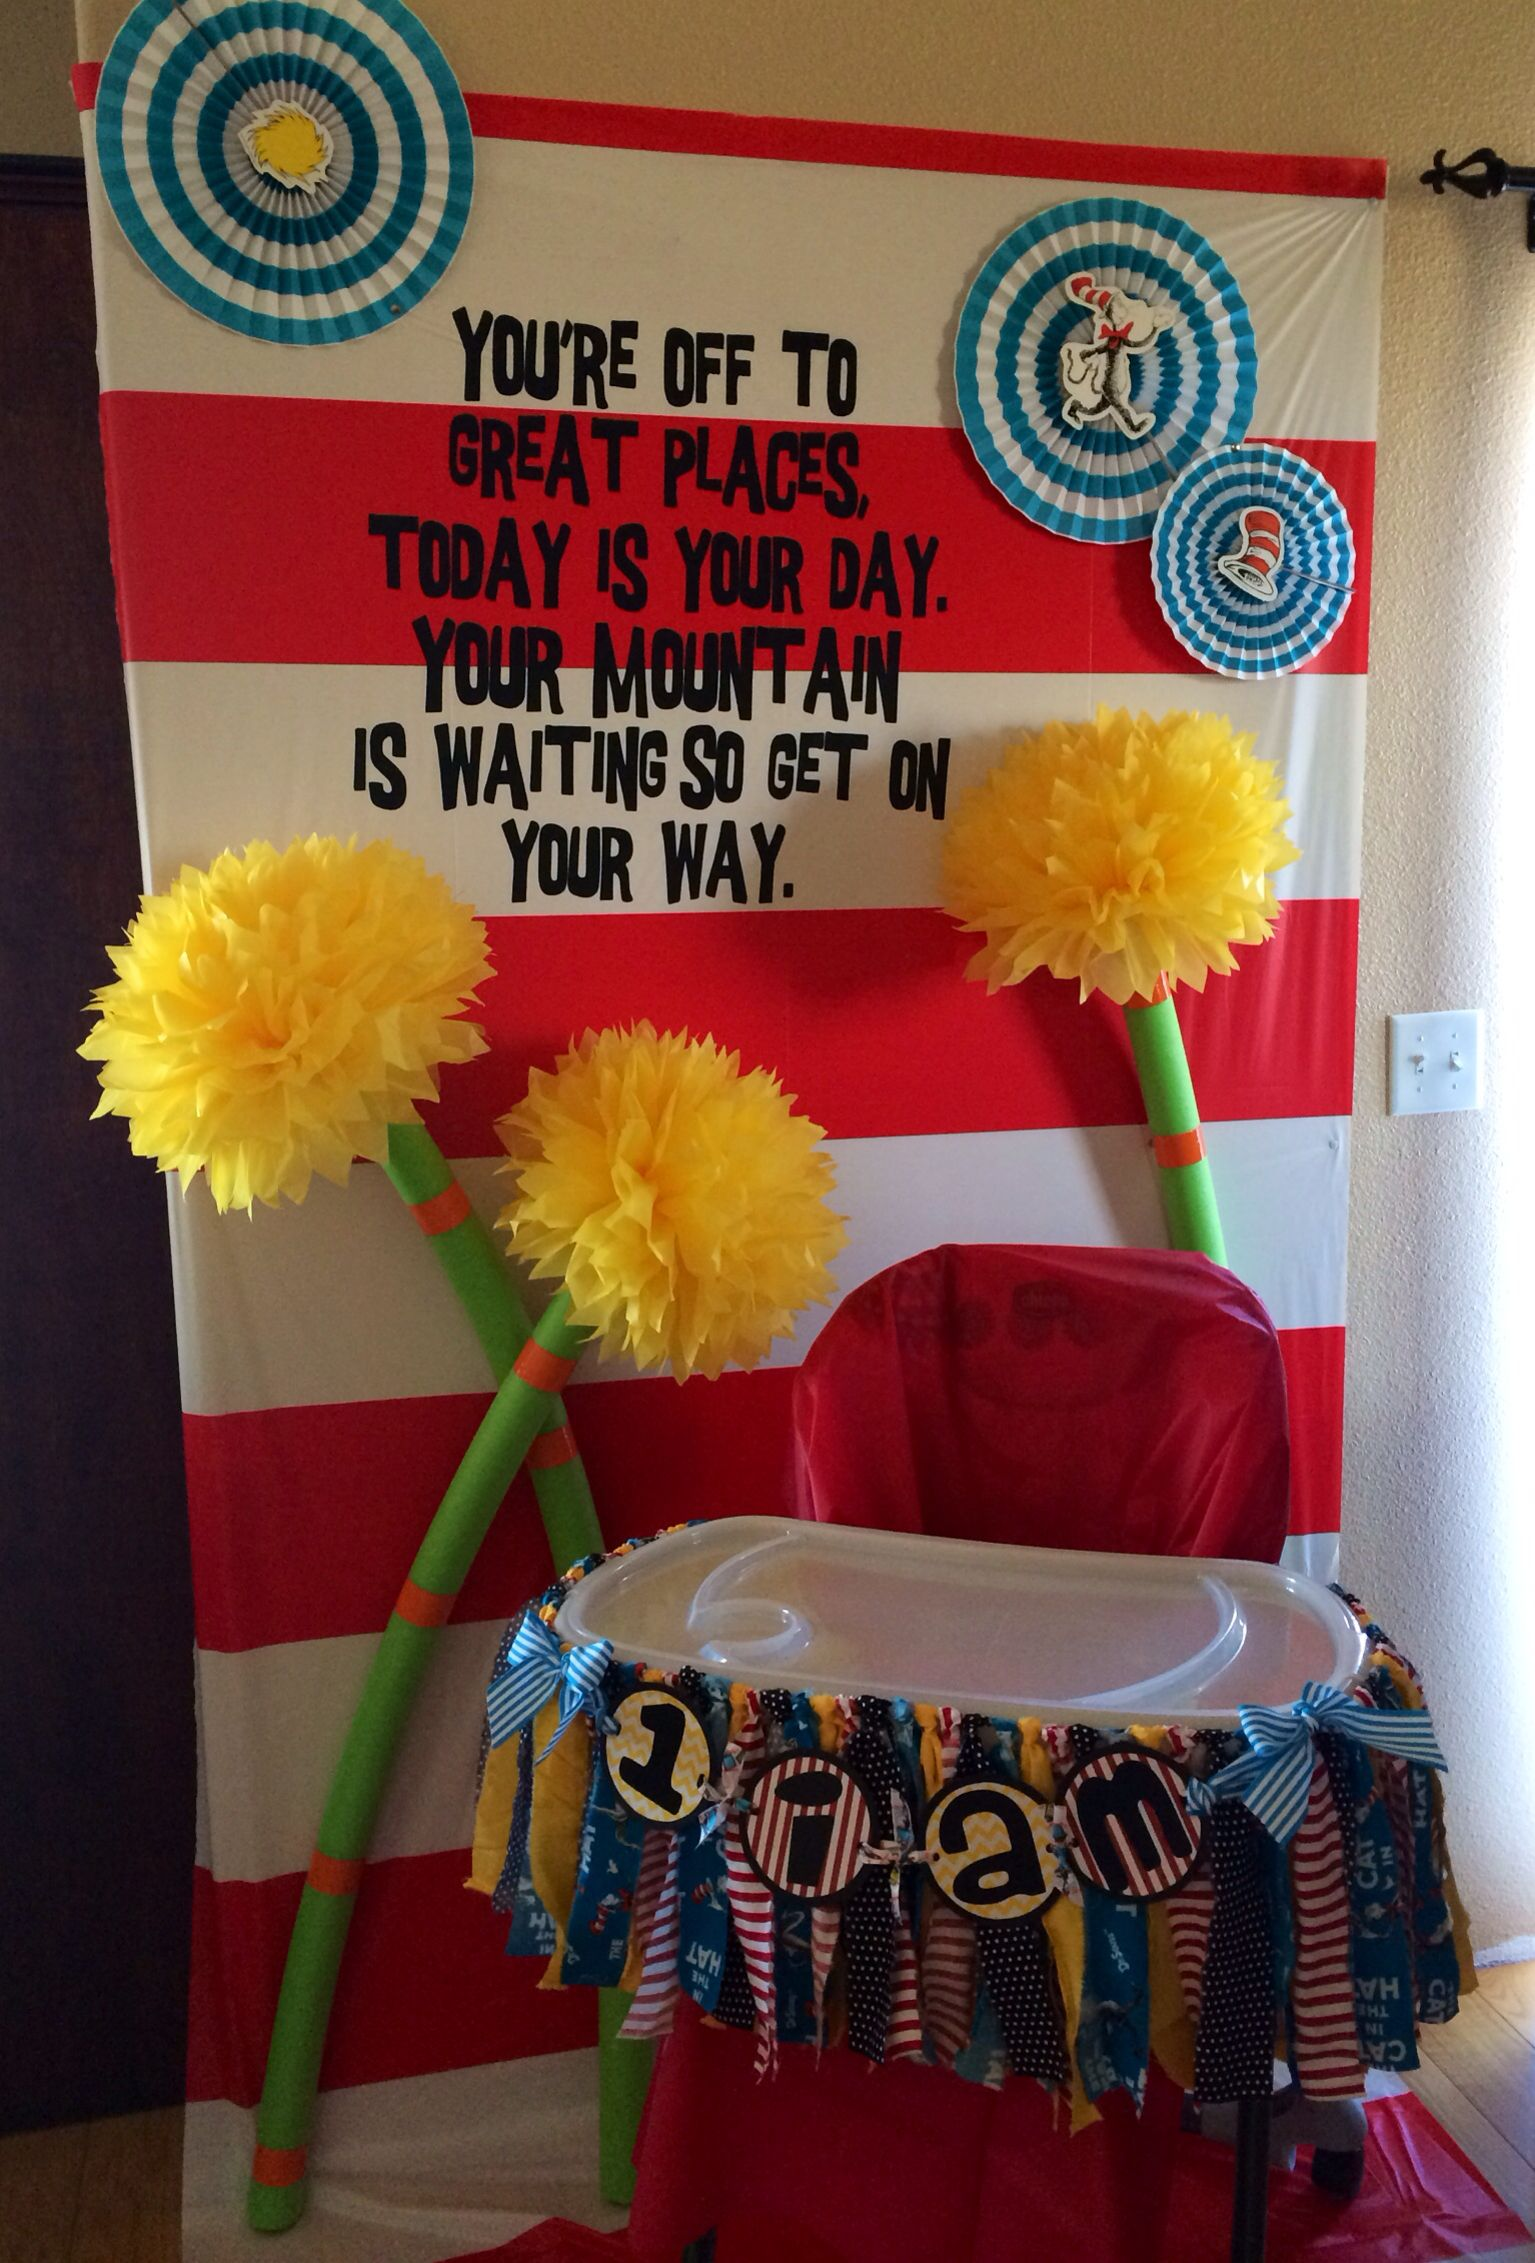 Cake Smash Backdrop Dr Seuss Rhyme Time Party Decorating Ideas Fans Vinyl Quote Dr Suess Birthday Party Ideas Dr Seuss Party Ideas Dr Seuss Birthday Party